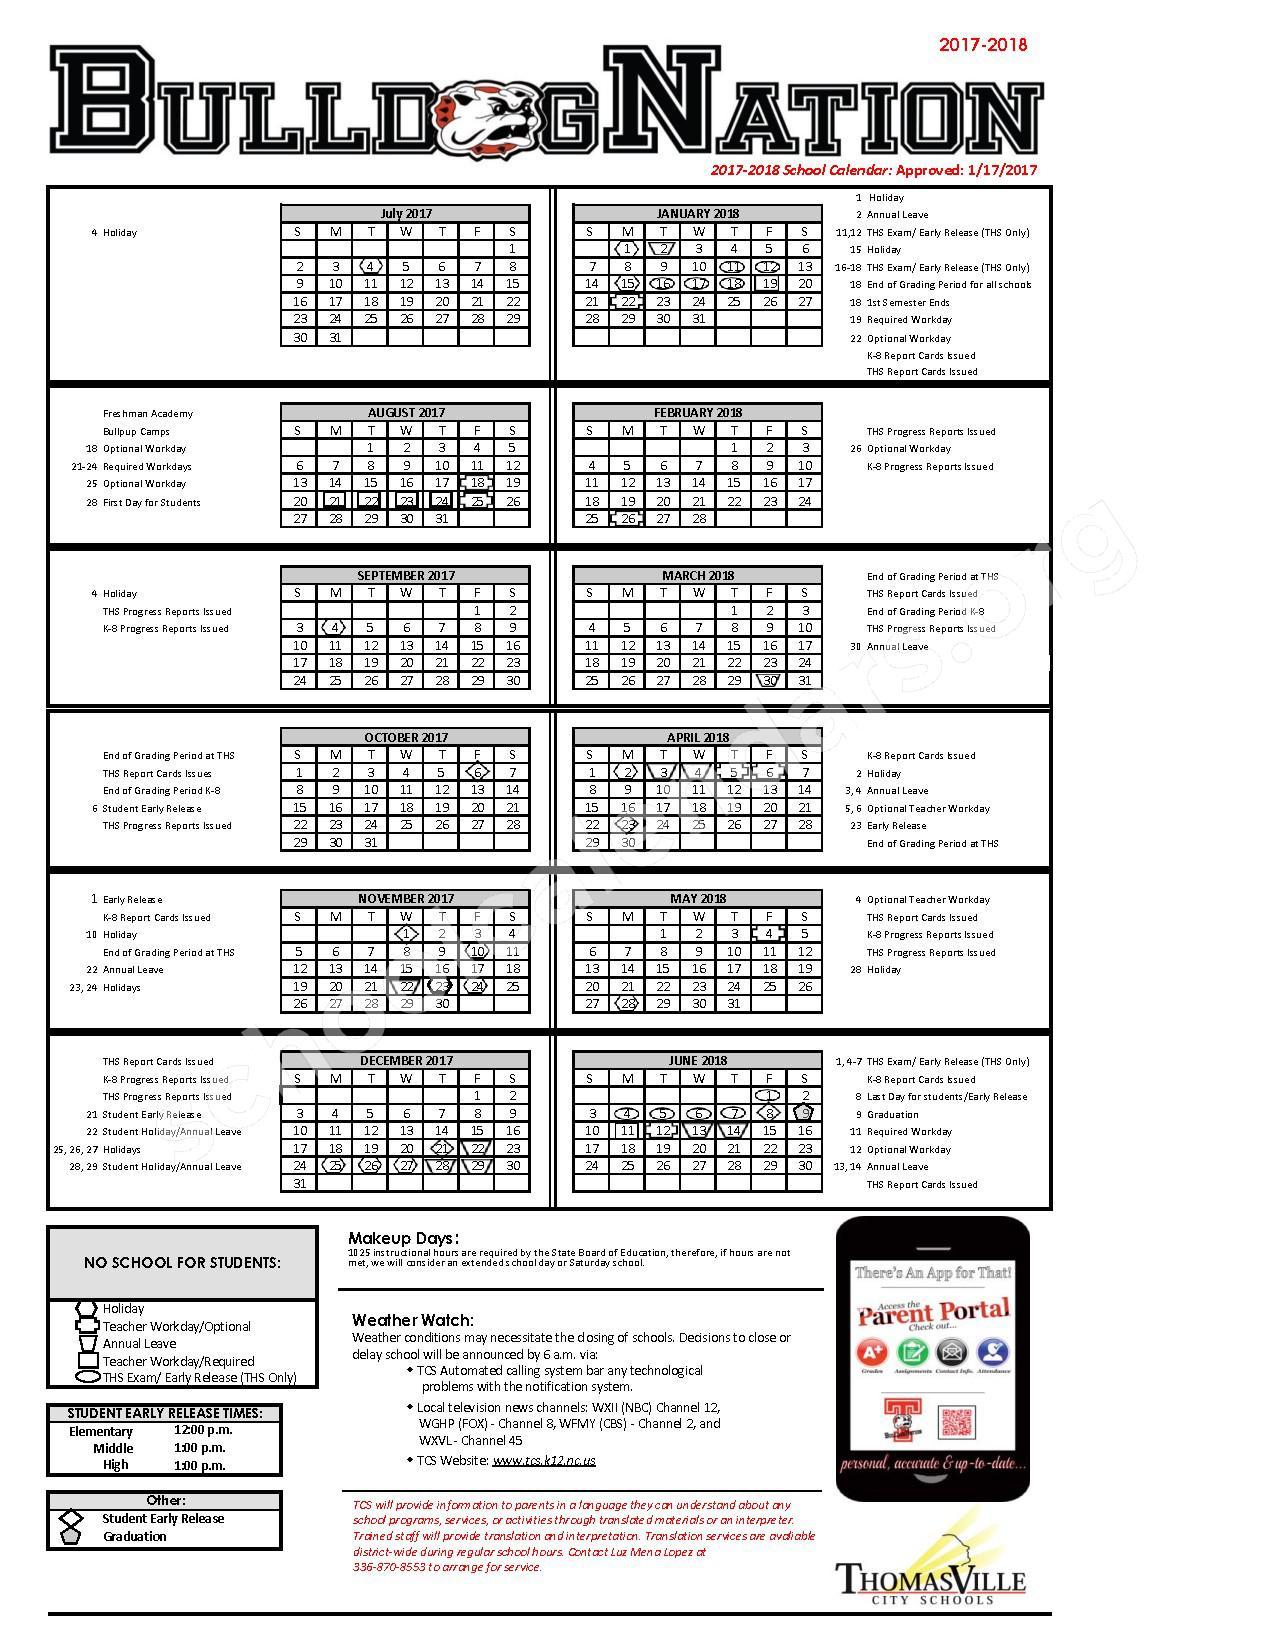 2017 – 2018 School Calendar | Thomasville City Schools For Calendars/State.nc.us